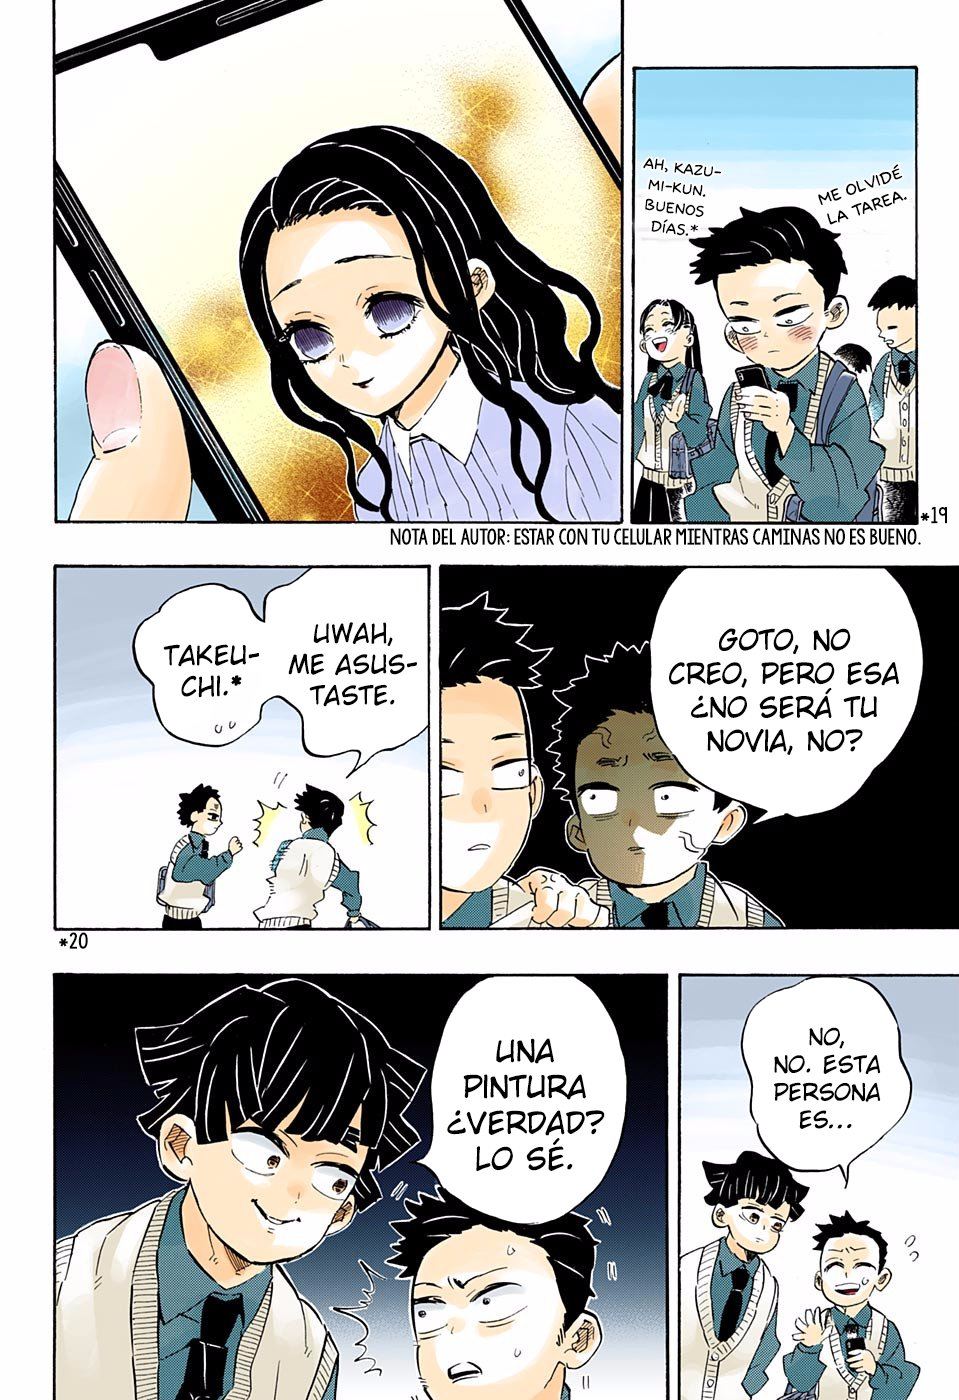 https://nine.mangadogs.com/es_manga/pic8/3/19331/946720/e5866439dc540752ef2150a3e2516852.jpg Page 18